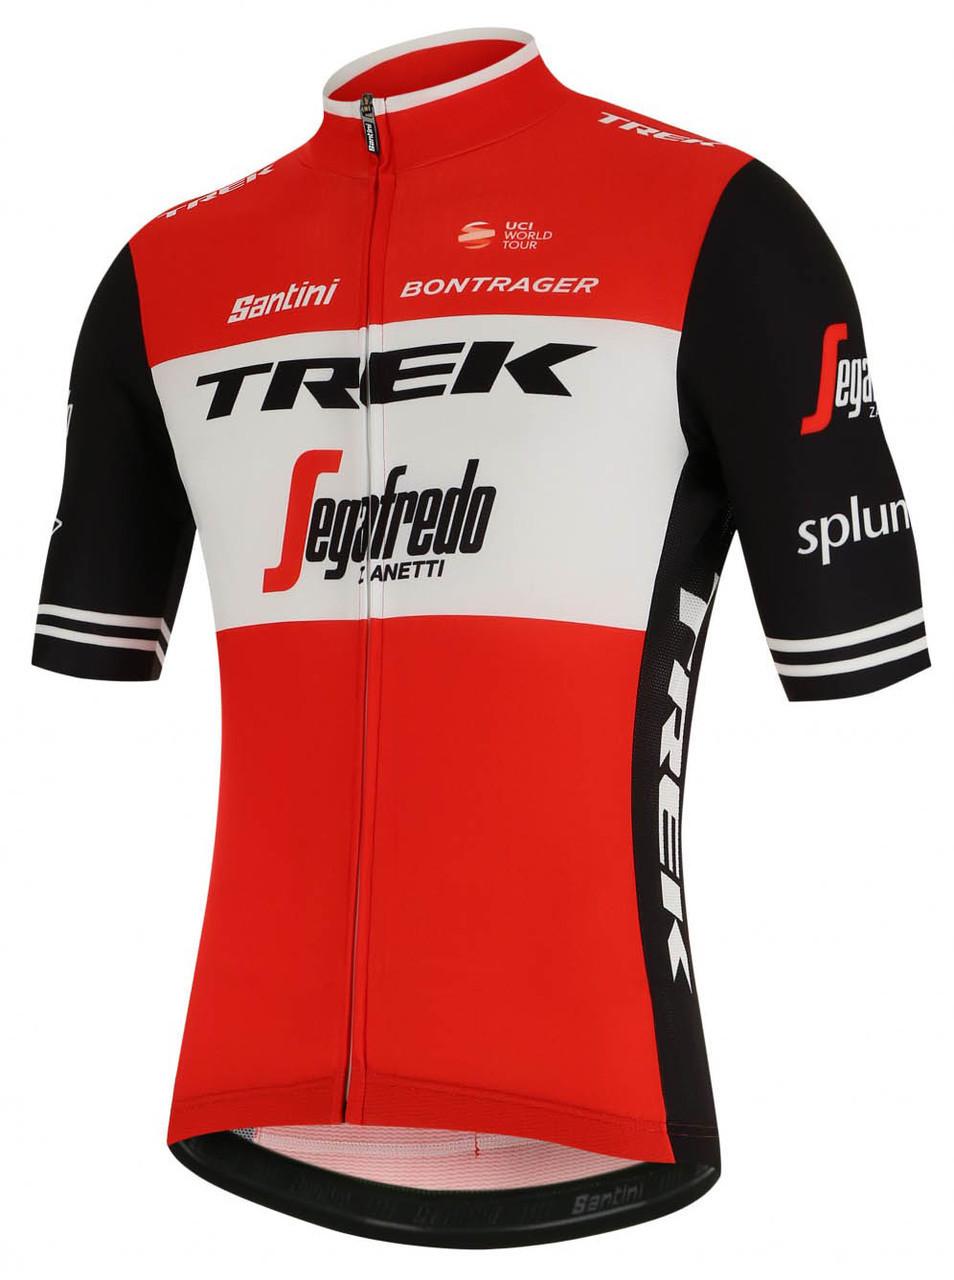 2019 Trek Segafredo FZ Jersey